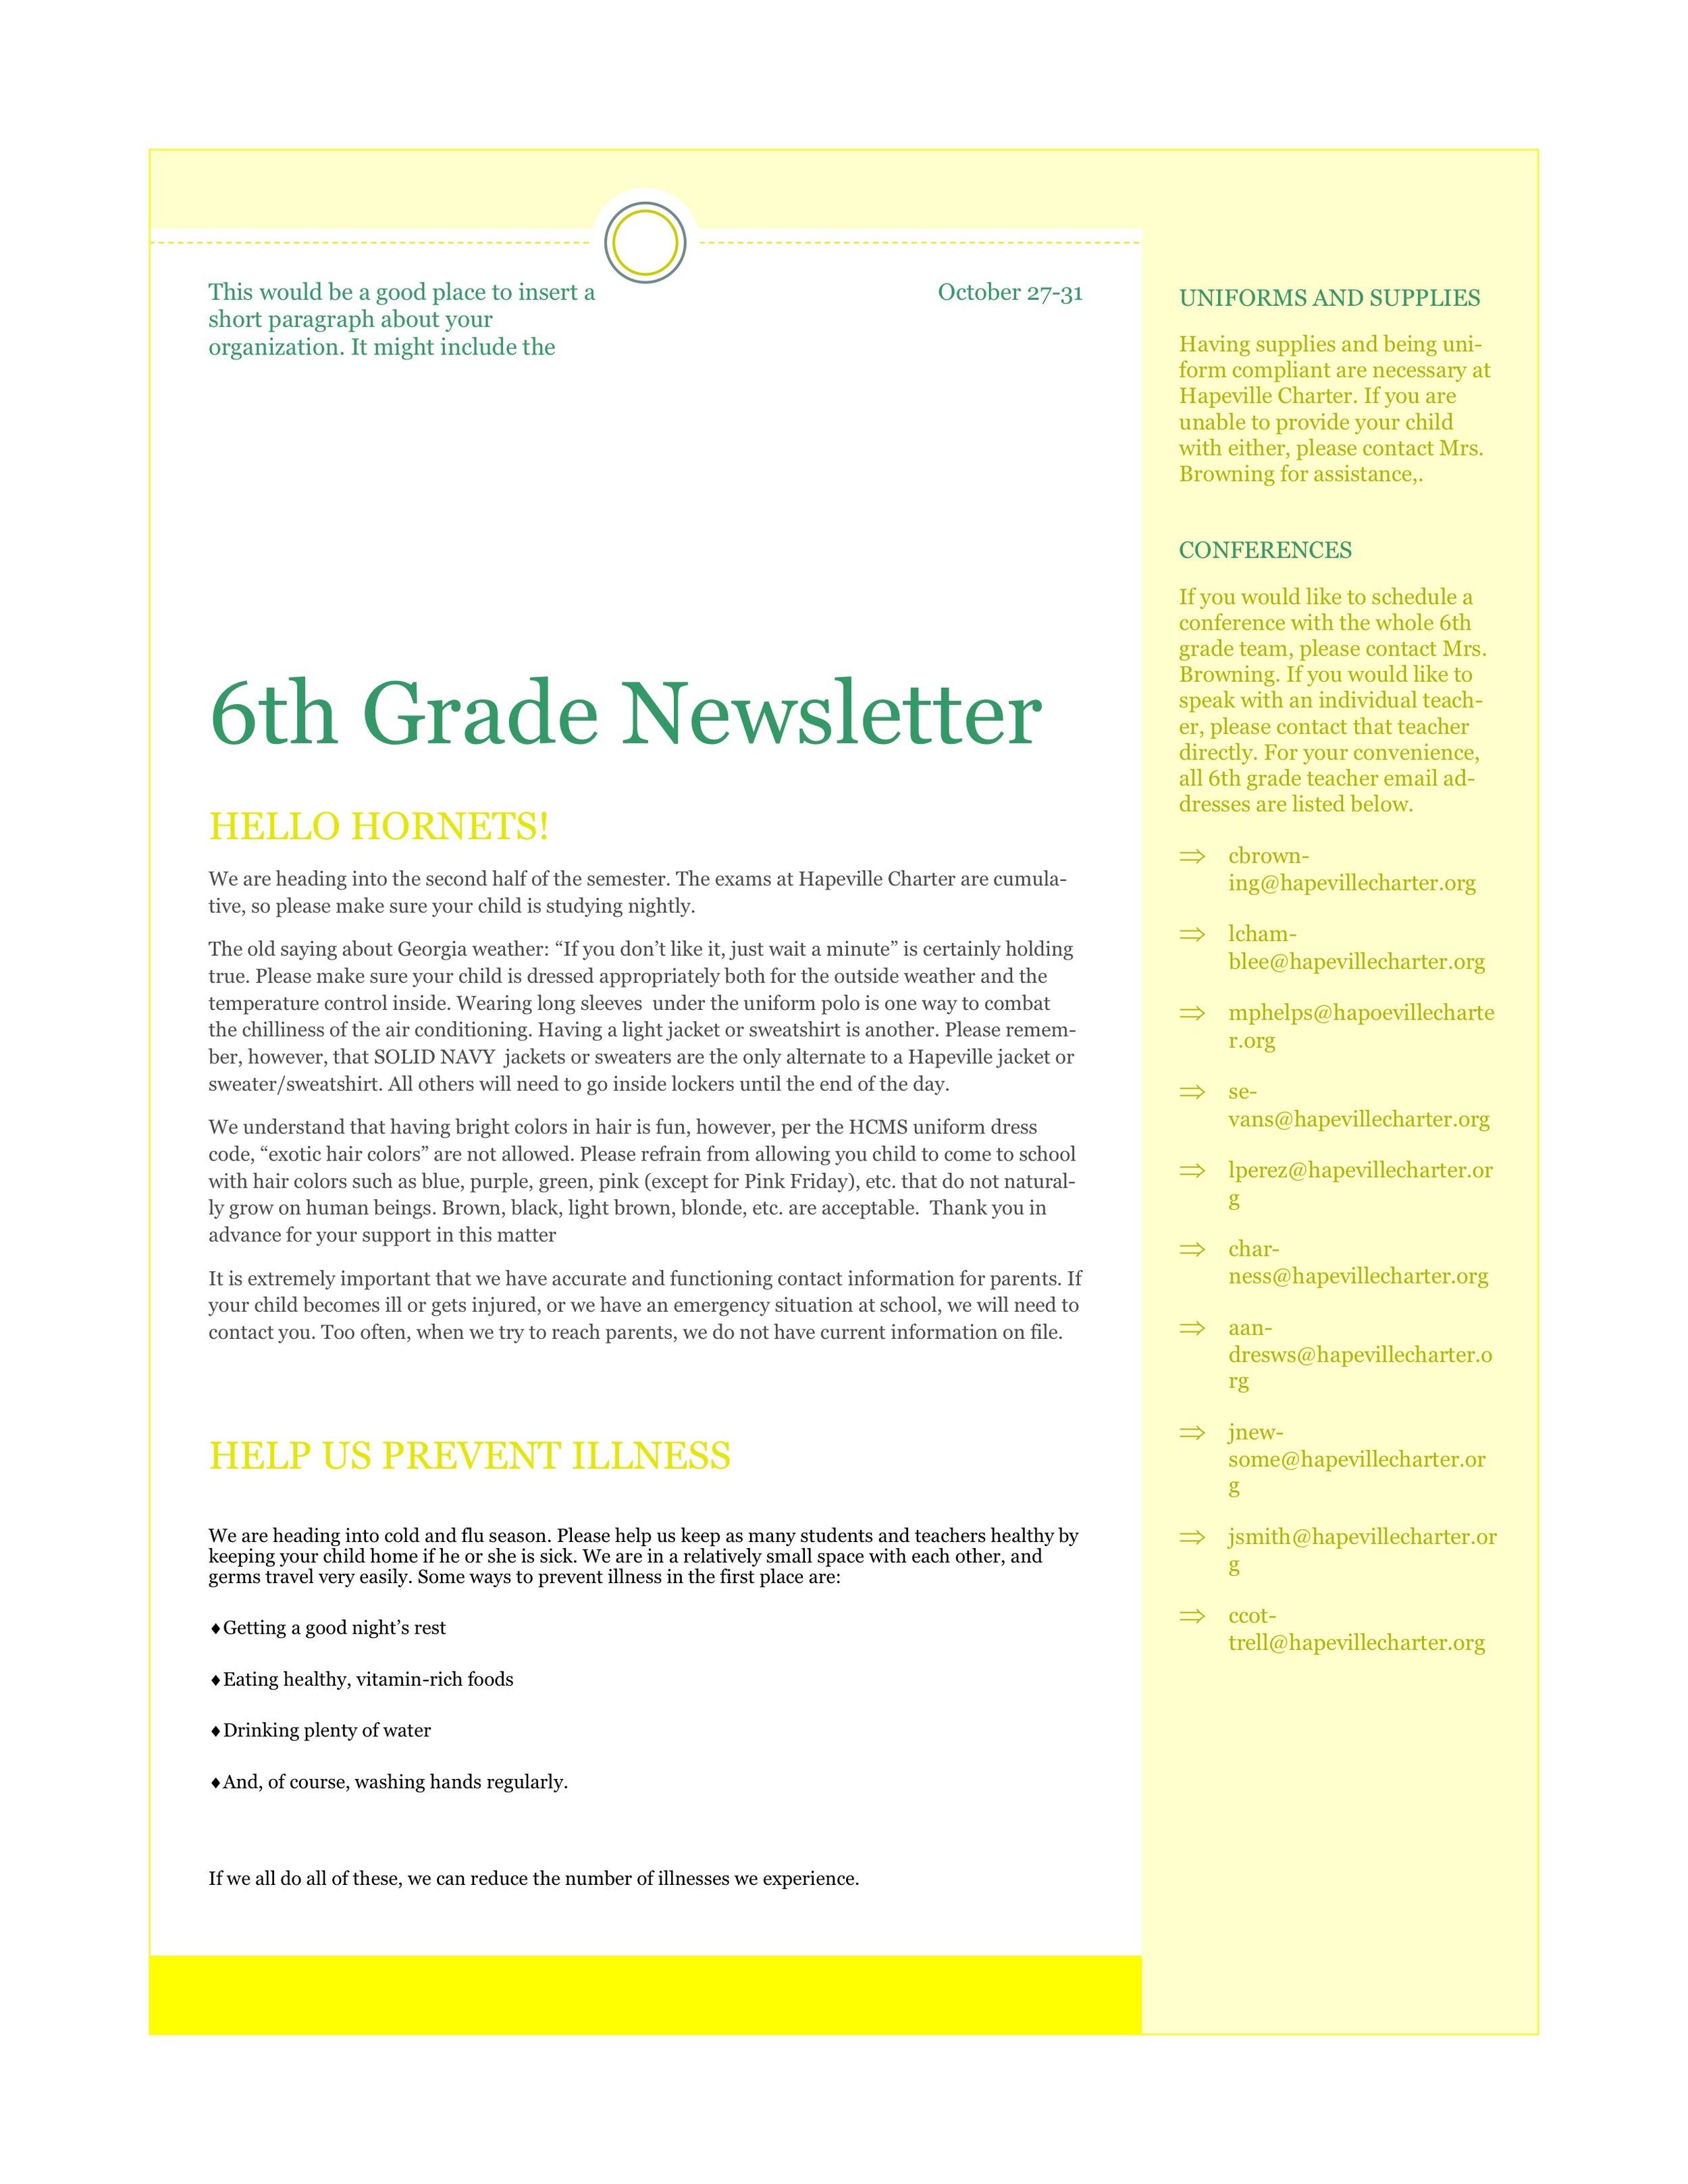 Newsletter Image6th grade October 27-31.jpeg